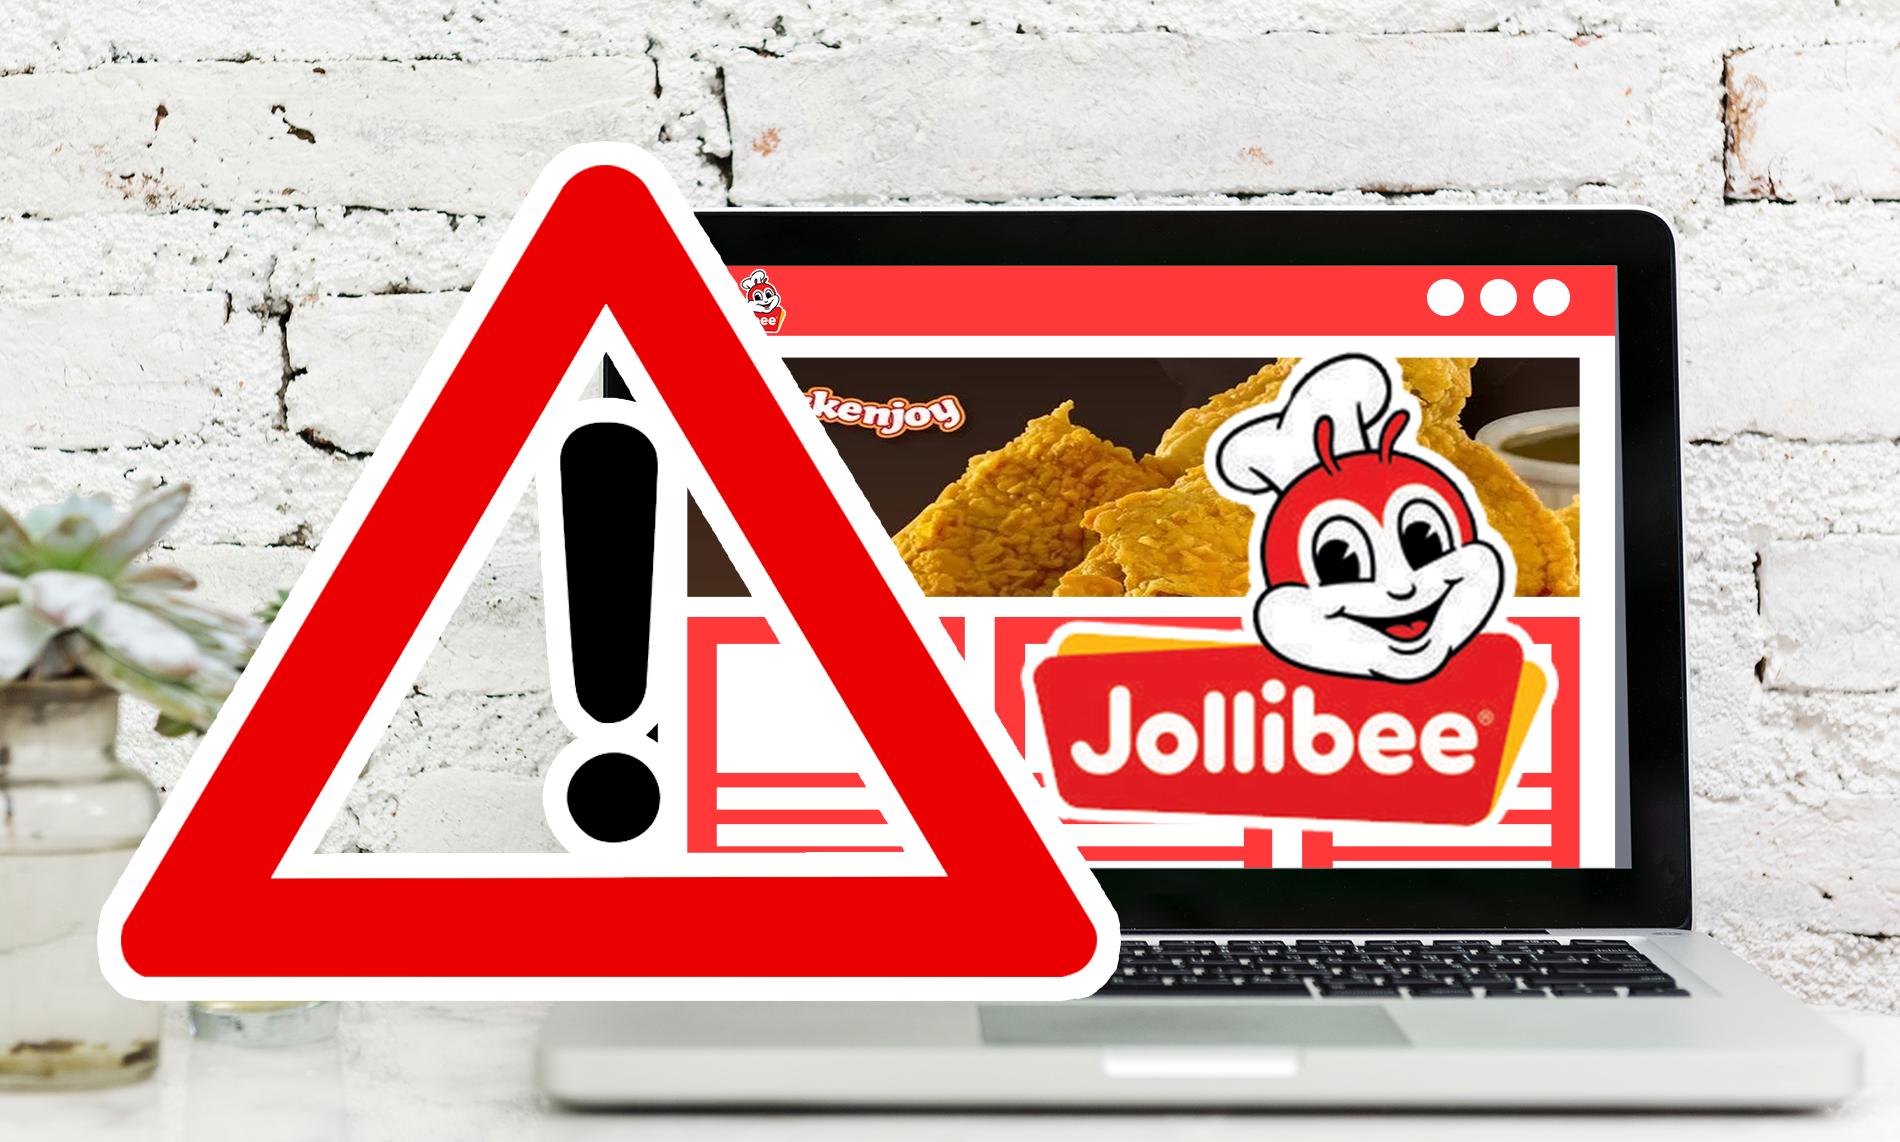 jollibee2